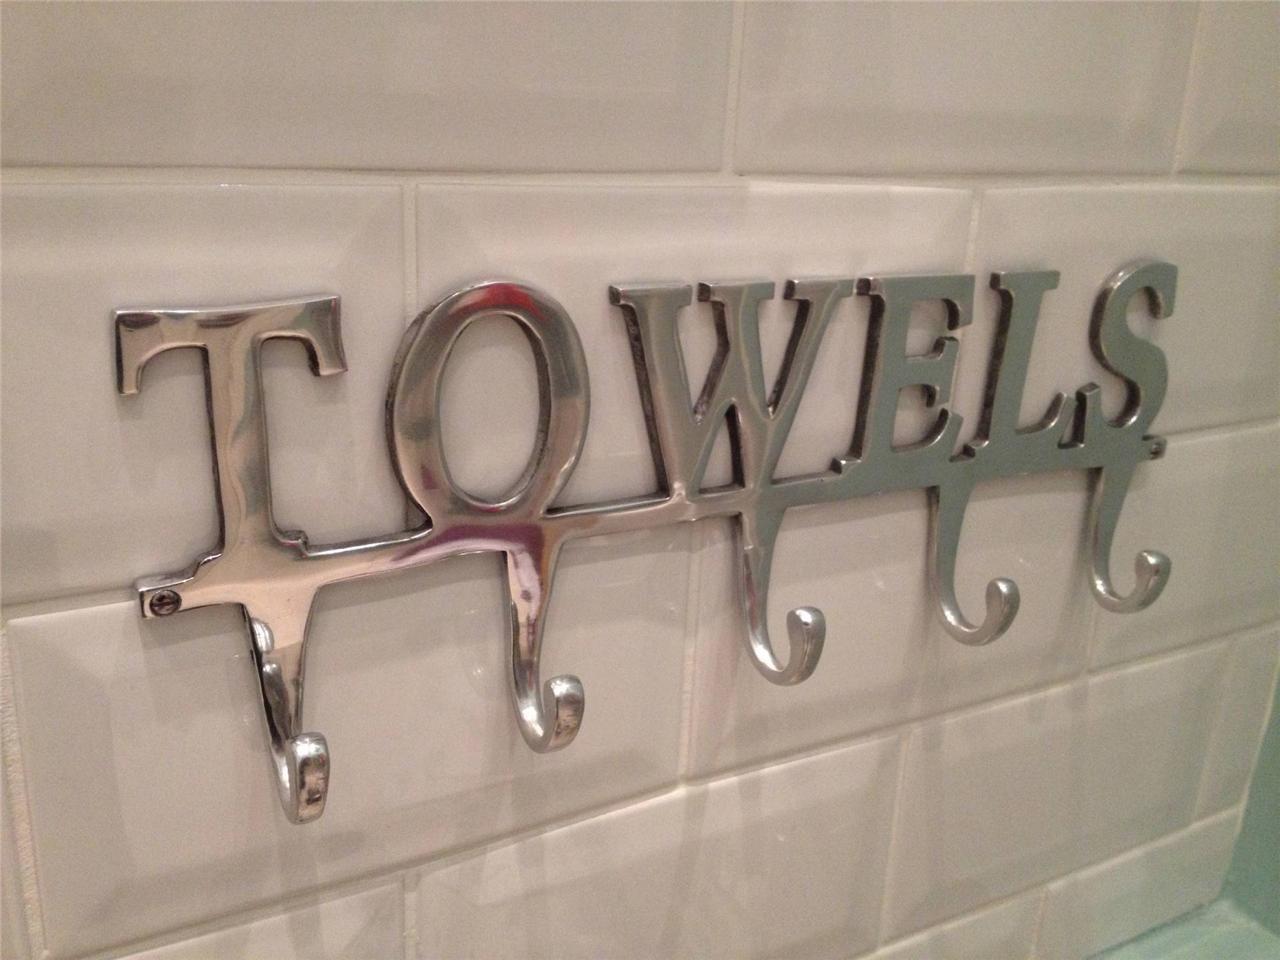 Bathroom Towel Hook Rack Unique Paper Towel Holders Double Paper Towel Rack With Hooks With Images Towel Holder Bathroom Bath Towel Hooks Towel Rack Bathroom